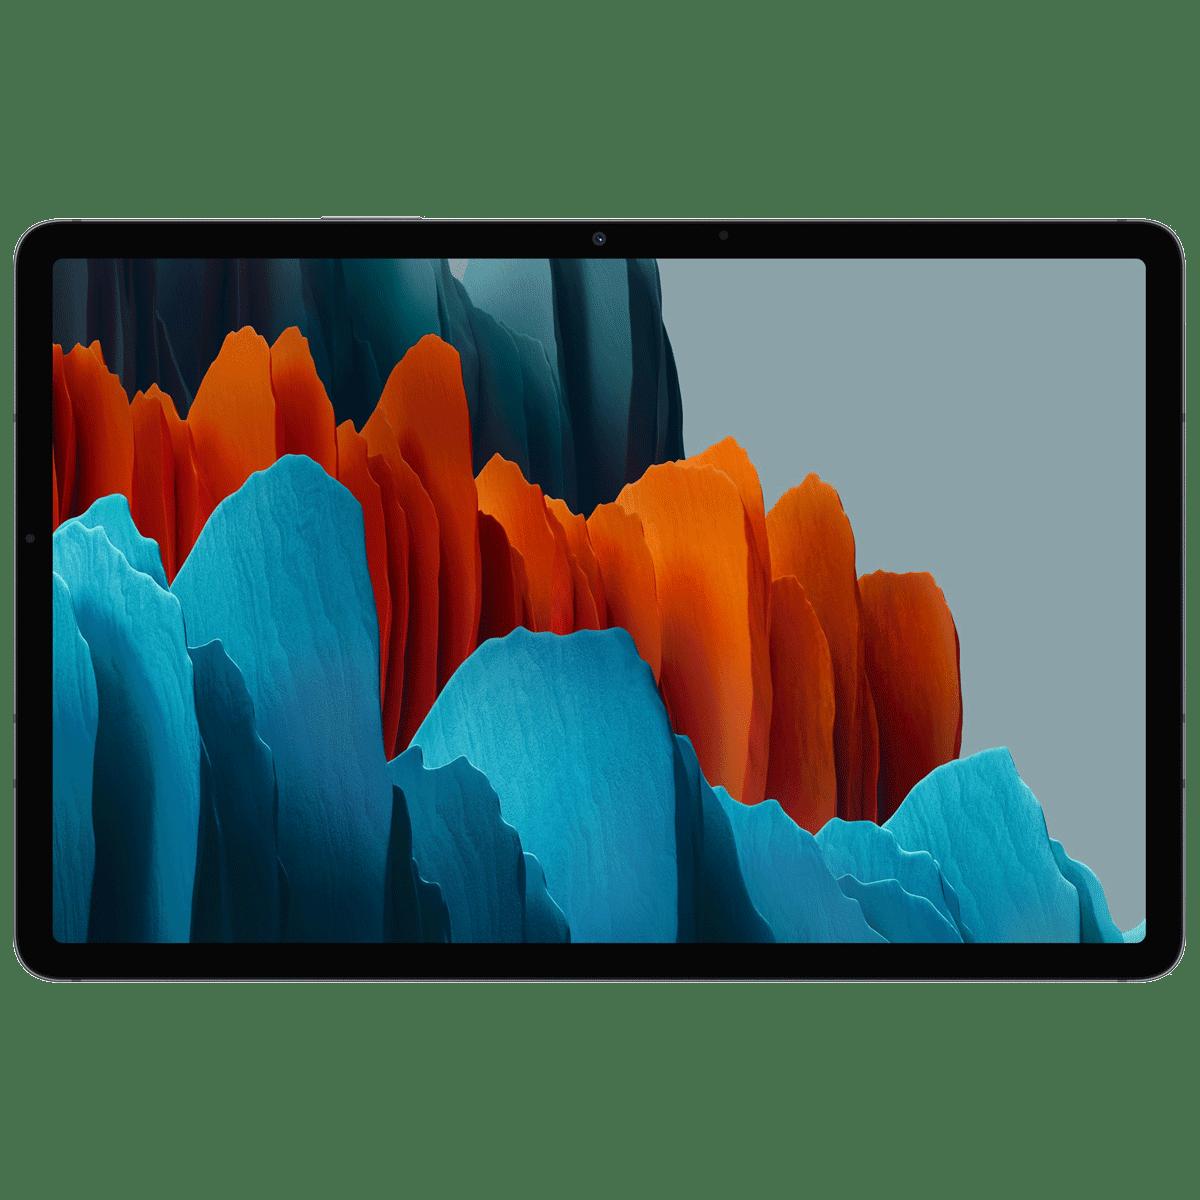 Samsung Galaxy Tab S7 Plus WiFi Android Tablet (Android 10, Qualcomm Snapdragon 865 Plus, 31.50 cm (12.4 Inches), 6GB RAM, 128GB ROM, SM-T970NZKAINU, Mystic Black)